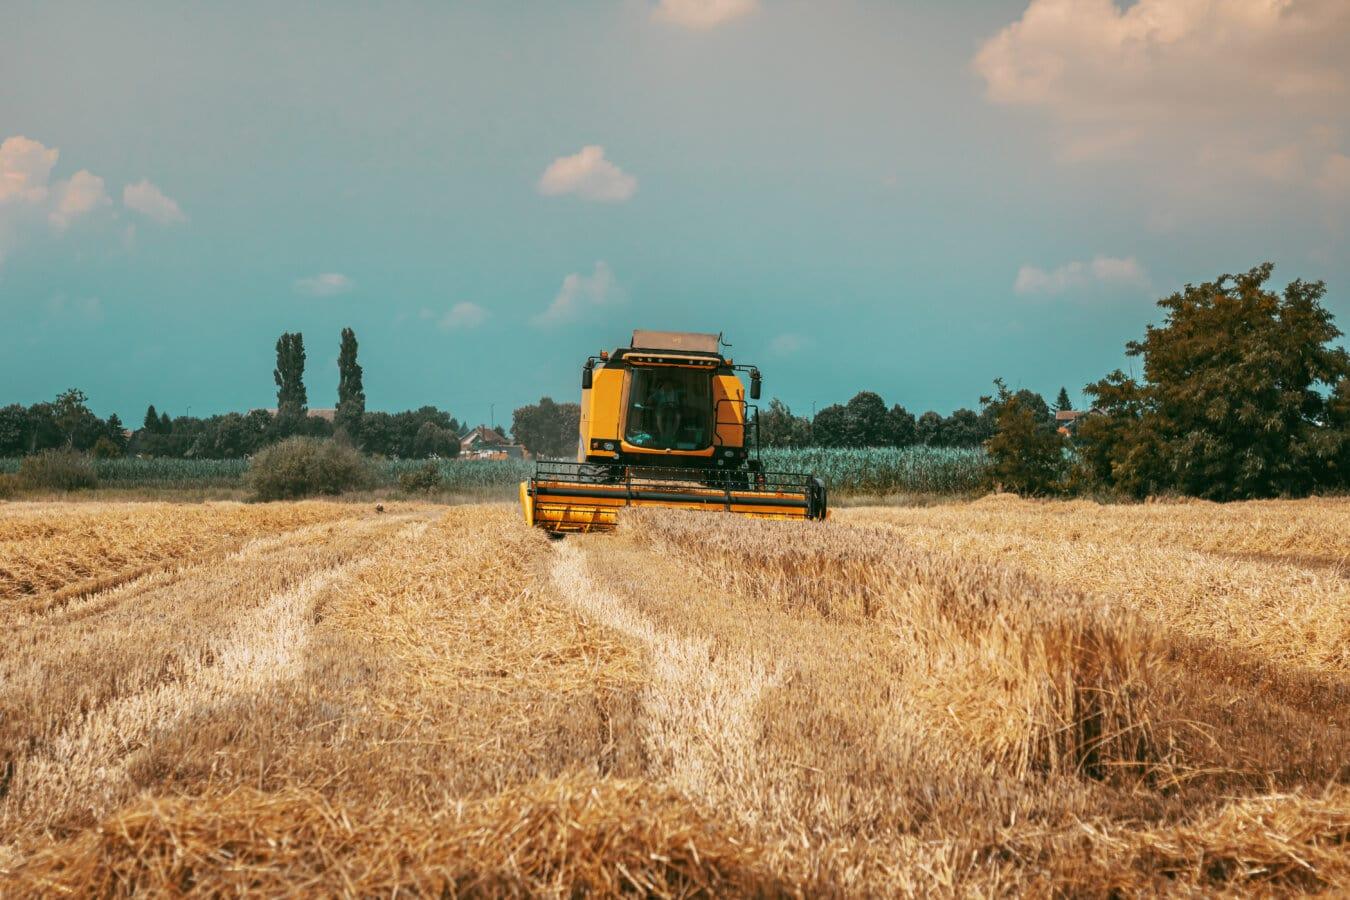 vete, Wheatfield, maskin, skördare, industriella, fältet, halm, landsbygdens, spannmål, jordbruk